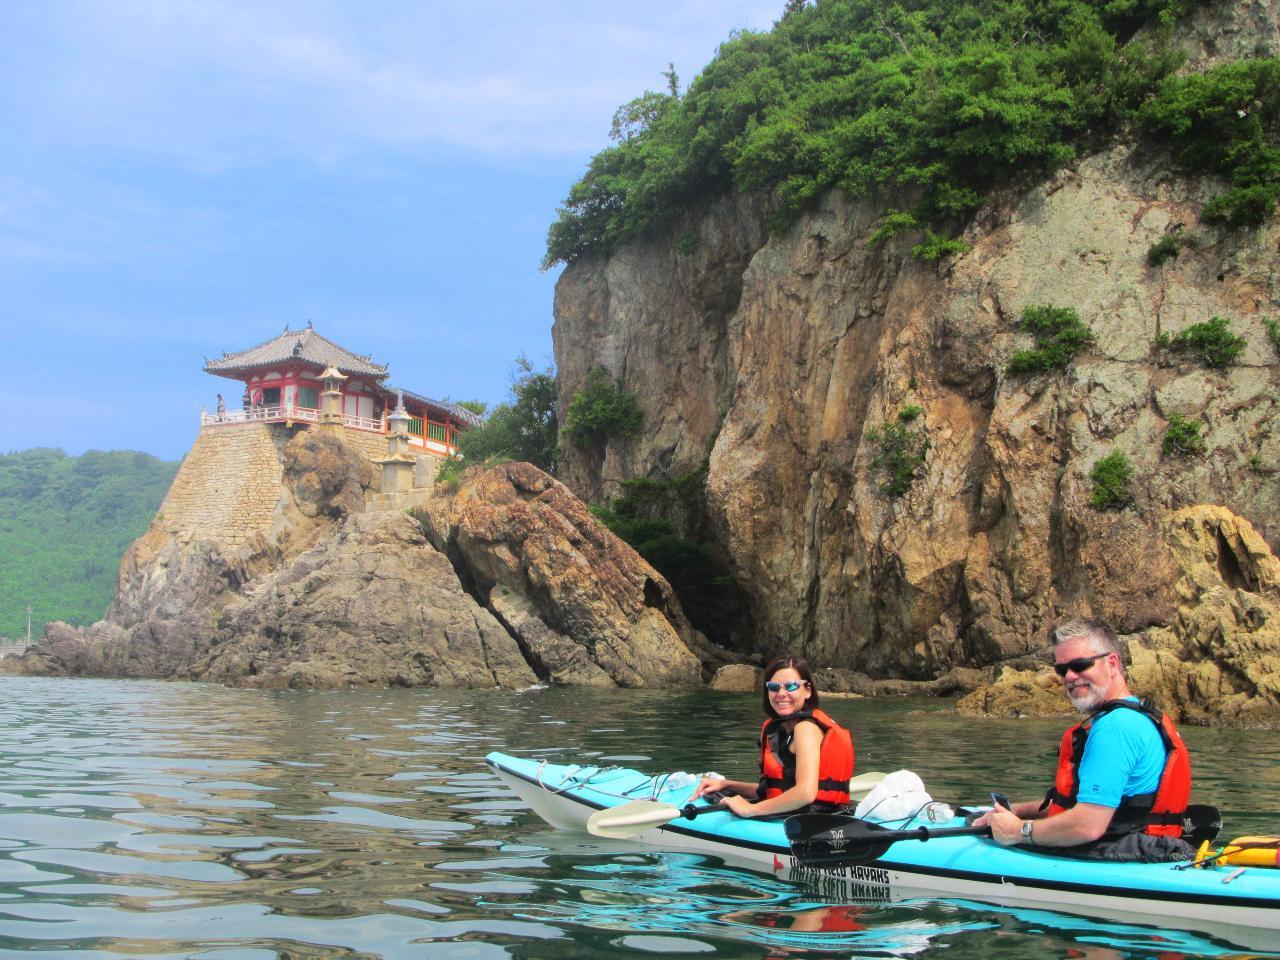 【Kayaker's Cafe】일본 제일의 경승지・도모노우라에서만 즐길 수 있는 바다 카약 투어 (1일) /日本一の景勝地・鞆の浦でここでしか行けないシーカヤックツアー(1日)